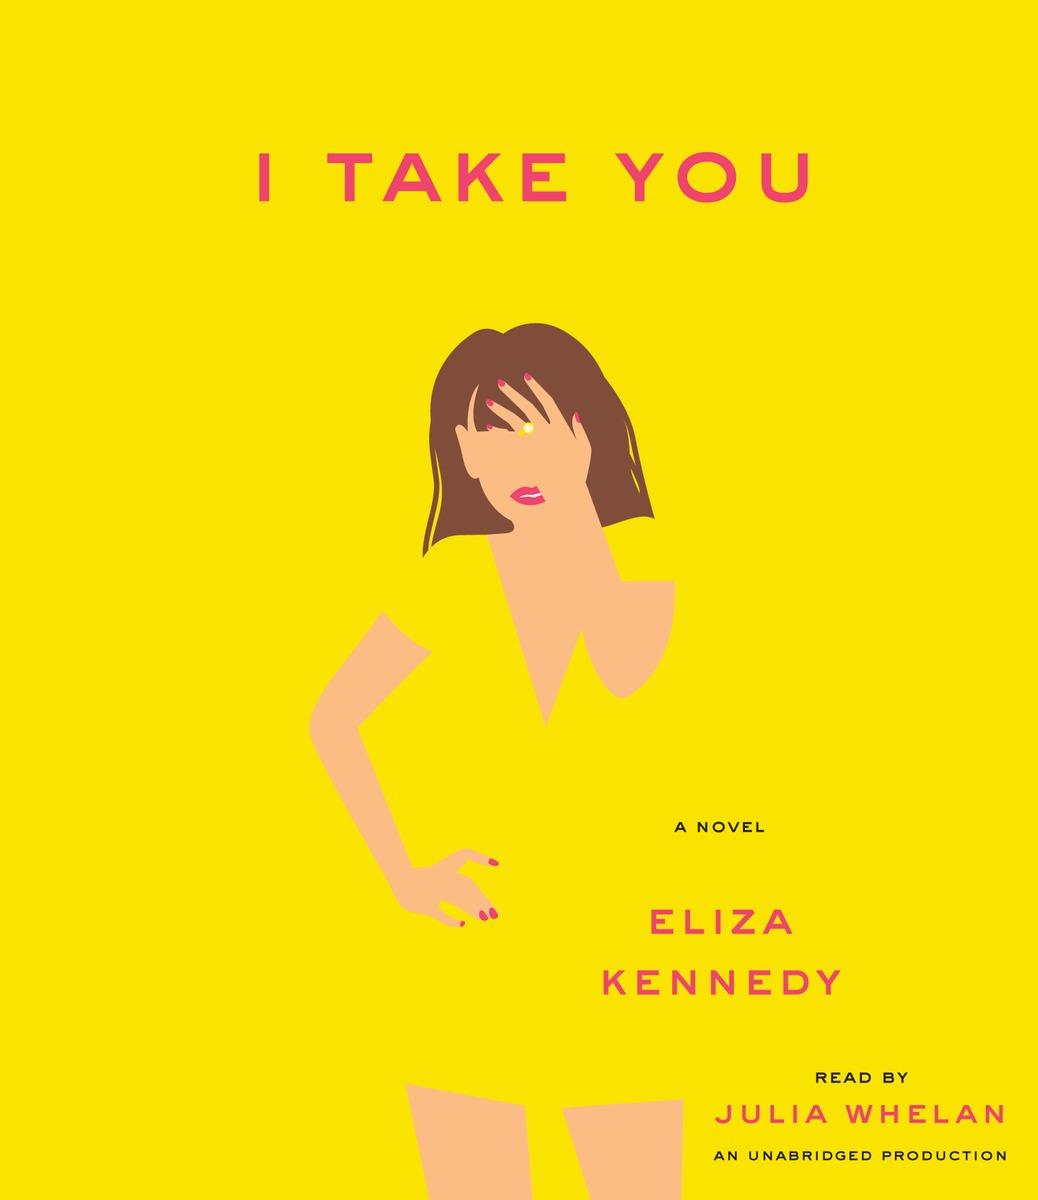 I TAKE YOU (UAB)(CD)